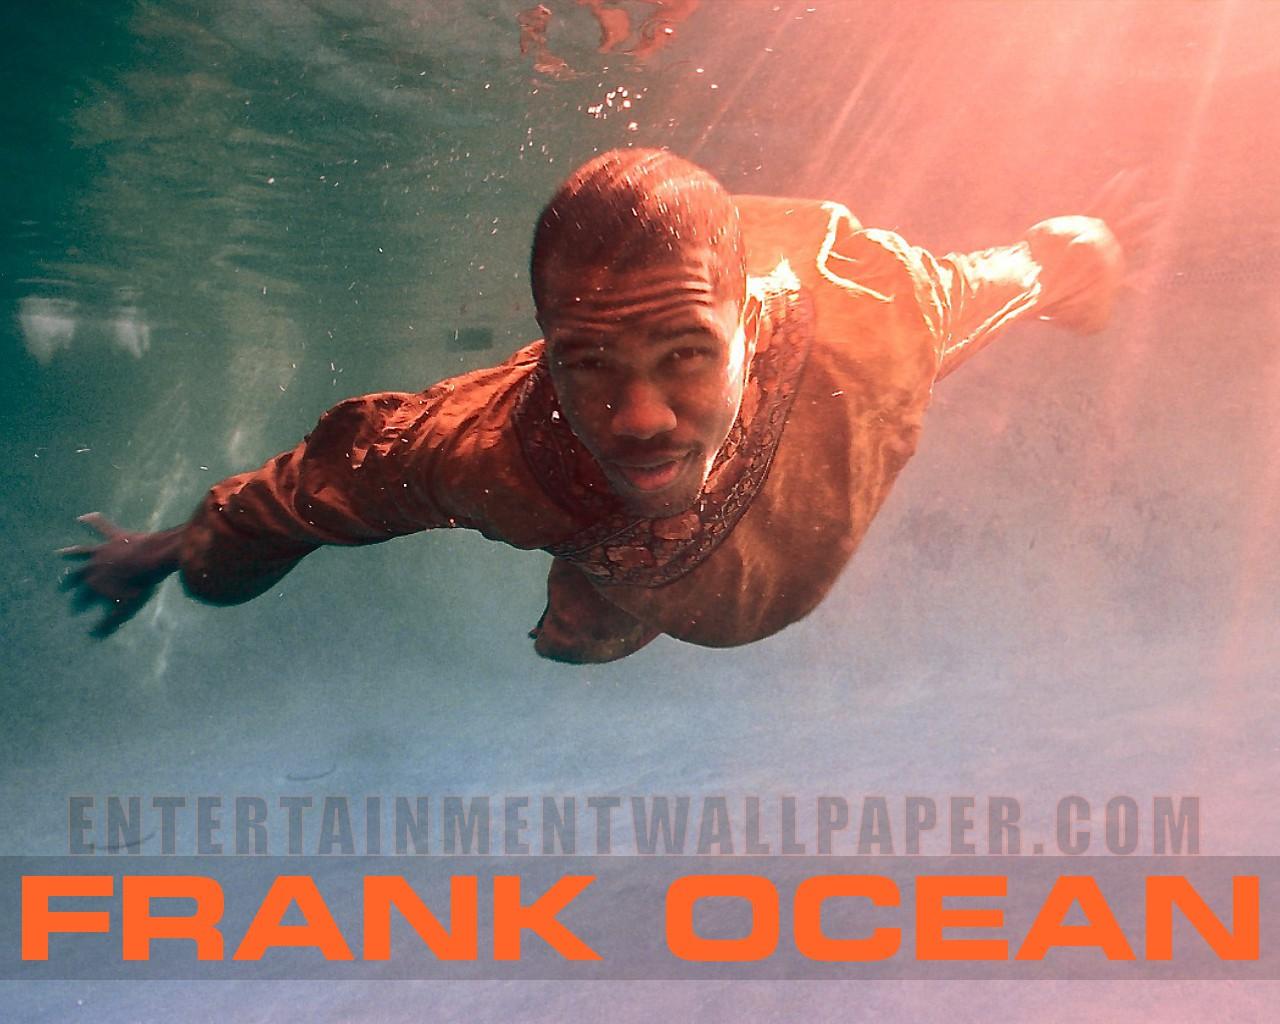 Frank Ocean Wallpaper   40033152 1280x1024 Desktop 1280x1024